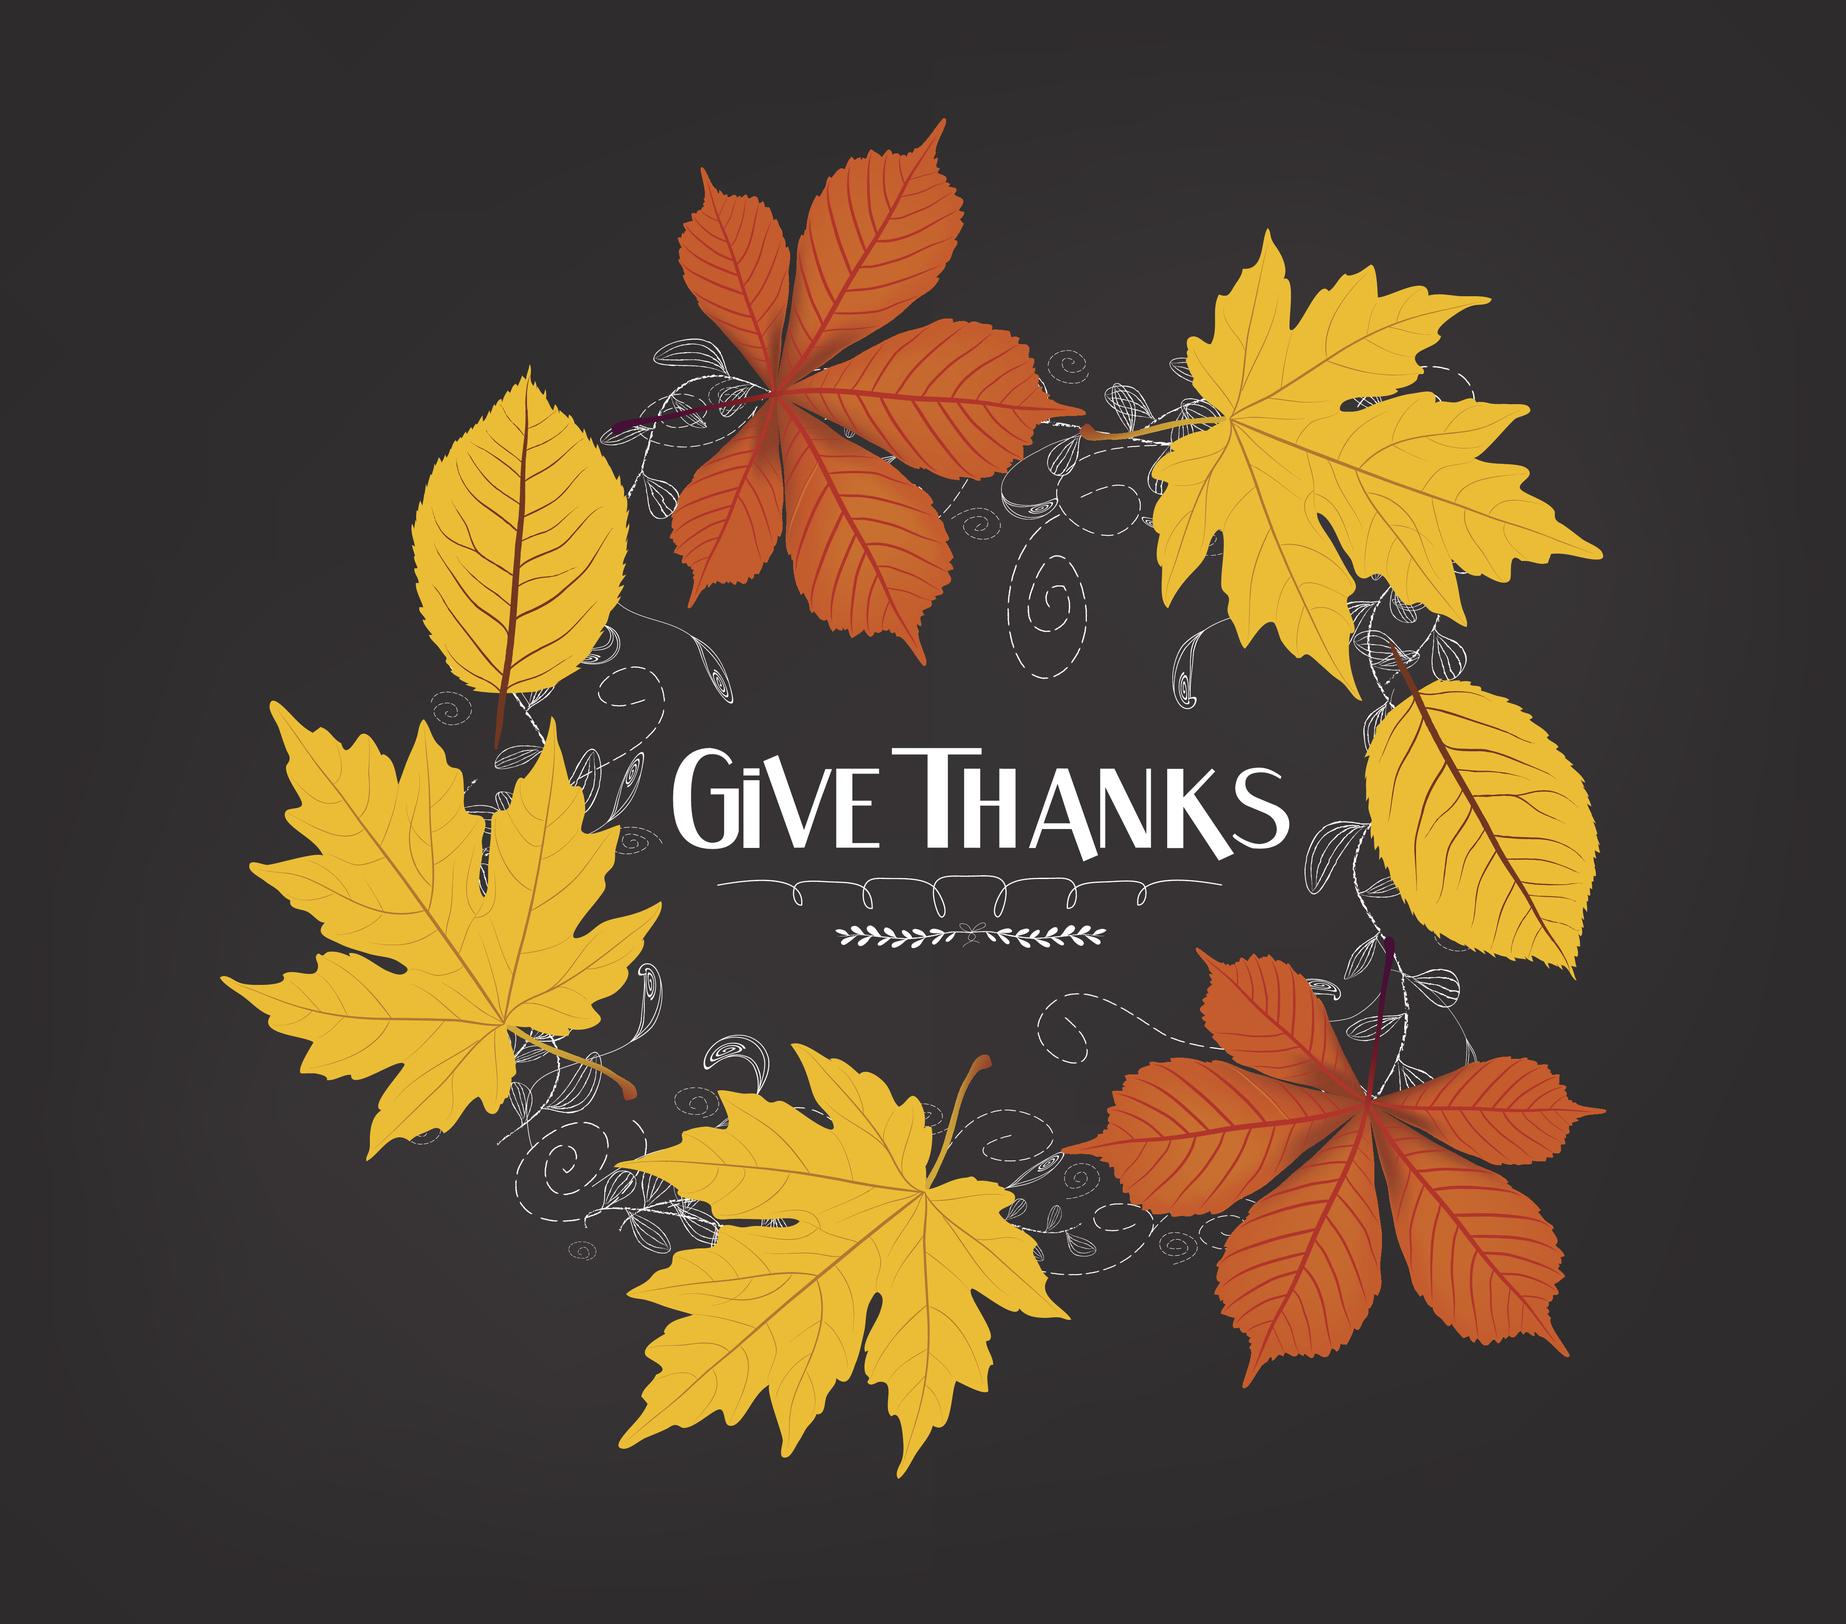 Marketing Tips to Celebrate Thanksgiving